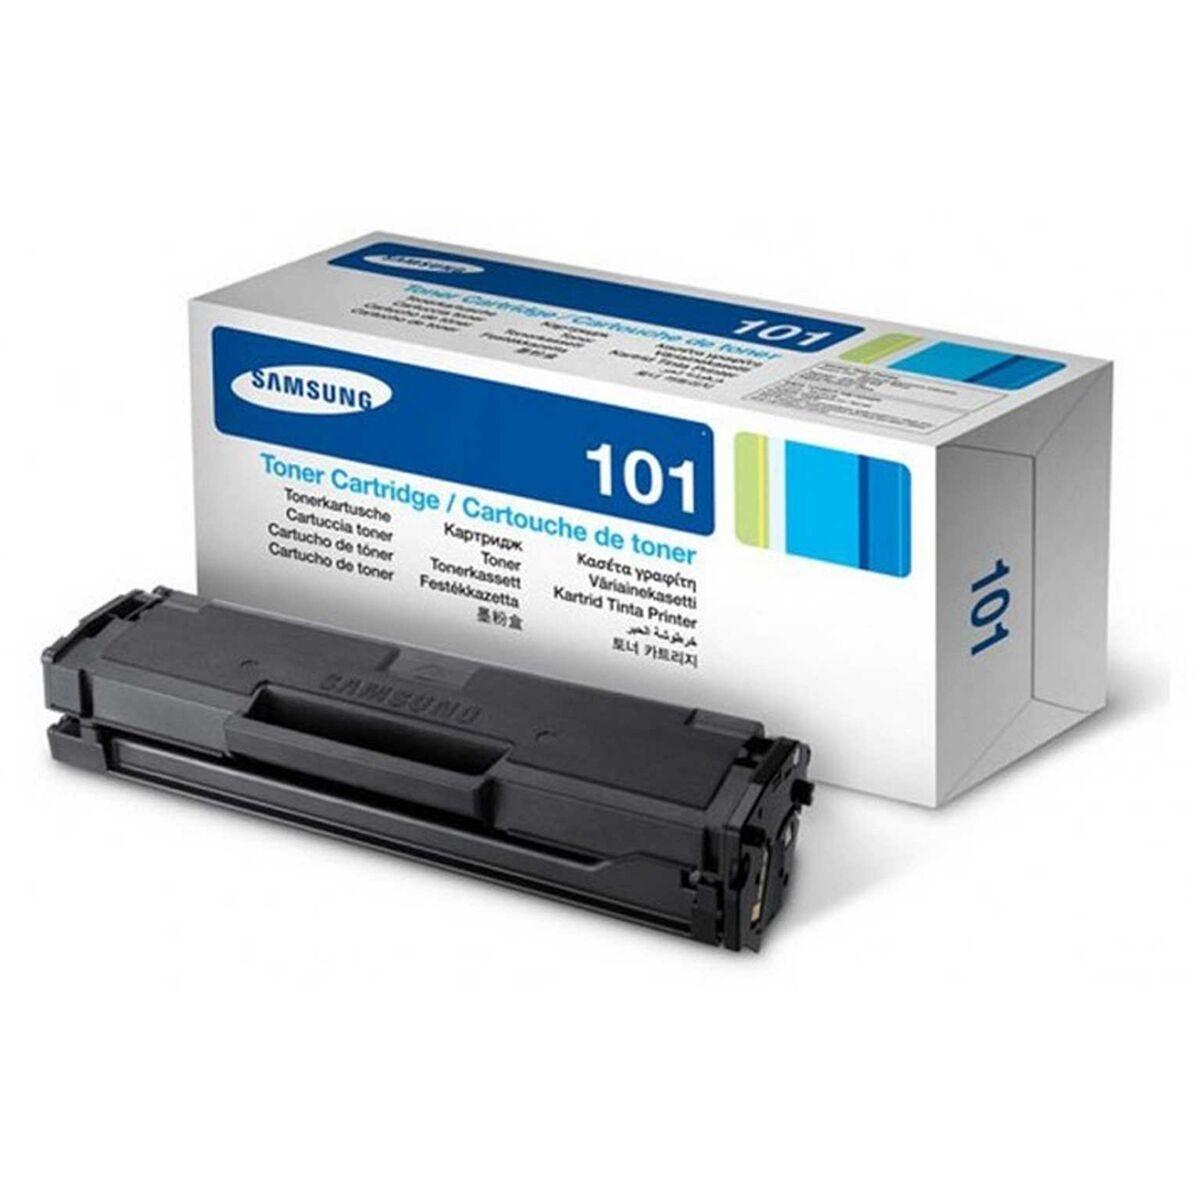 Samsung MLT-D101S Printer Toner Cartridge